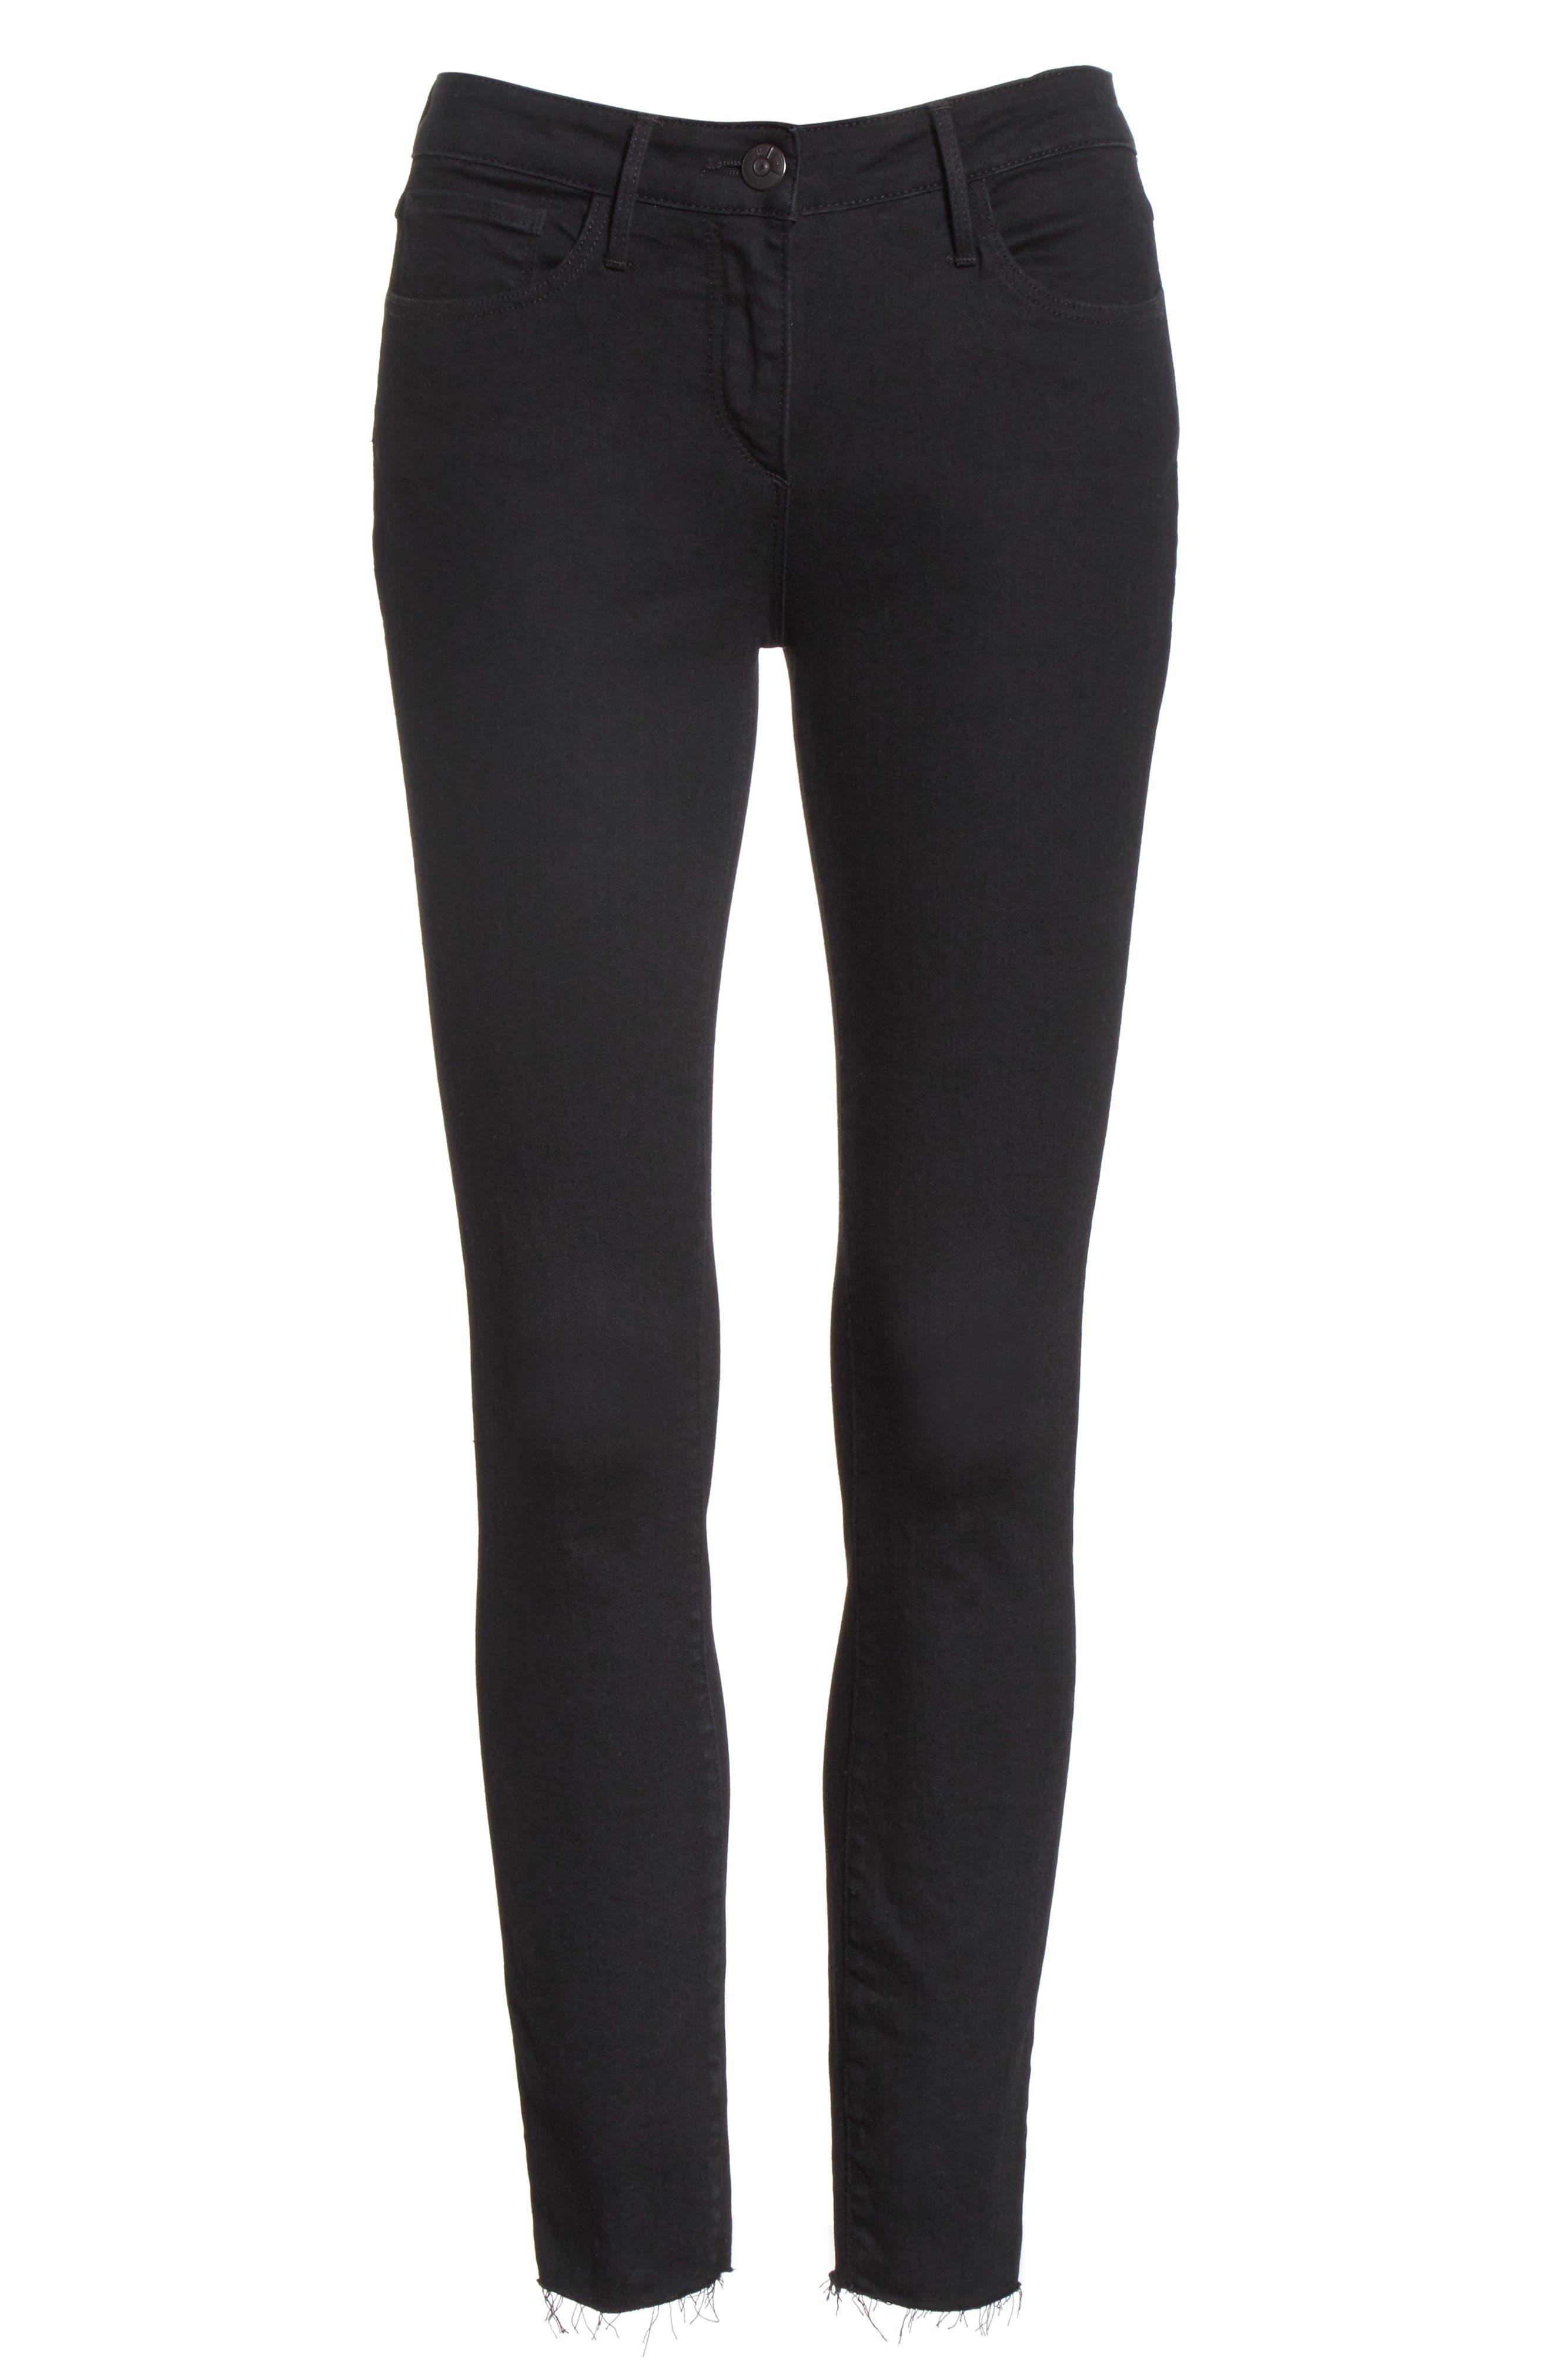 3X1 NYC,                             W2 Crop Skinny Jeans,                             Alternate thumbnail 6, color,                             BLACK TEAR